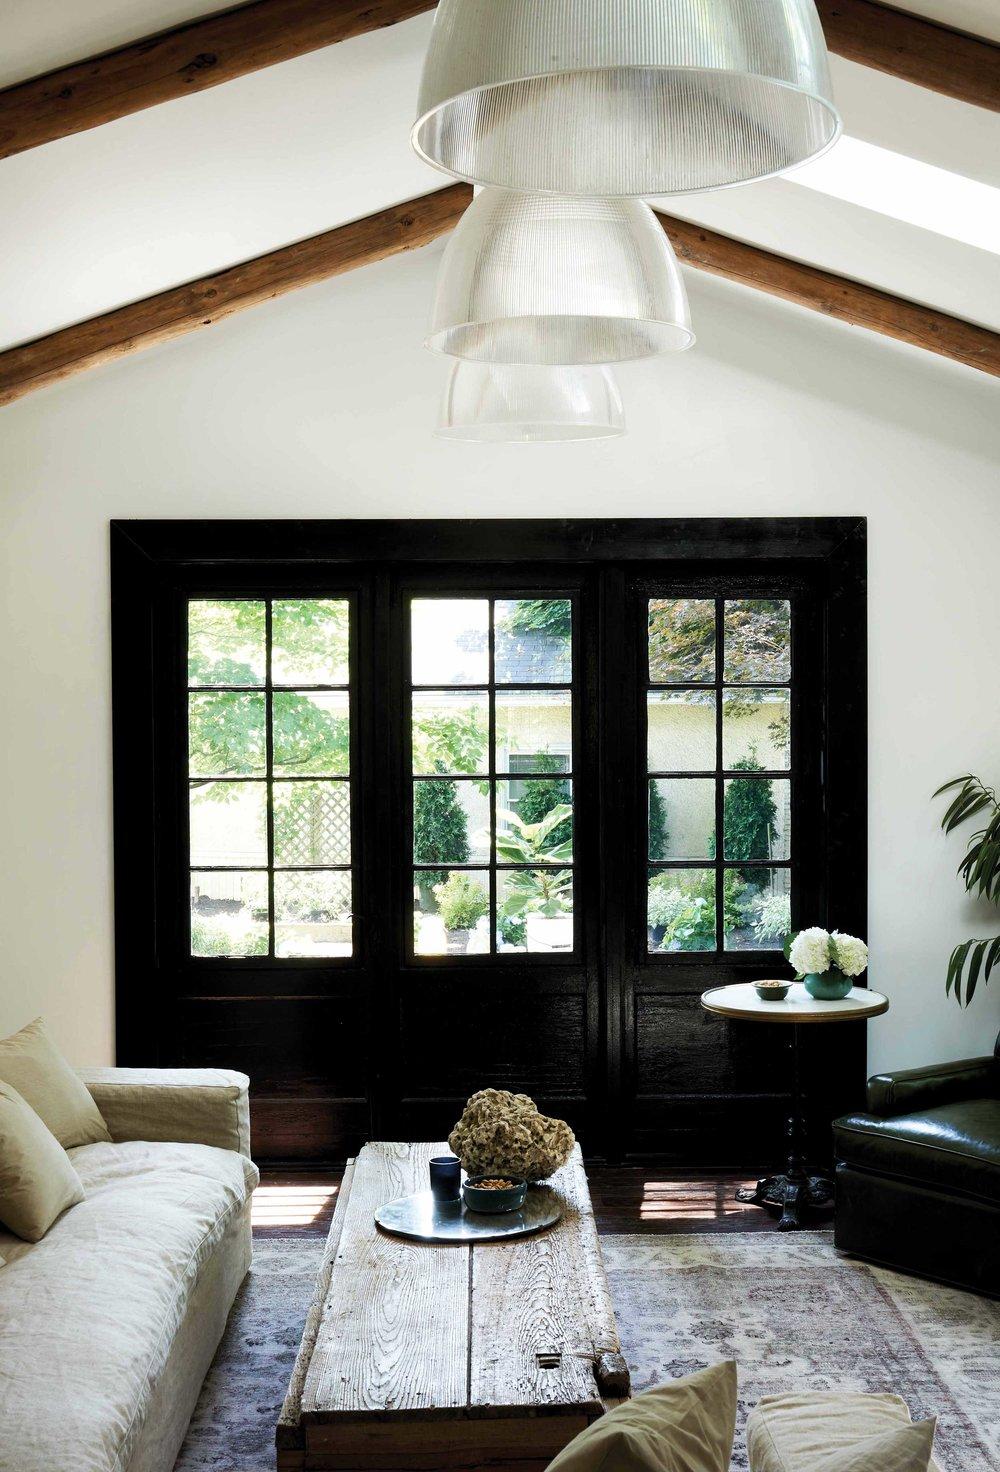 Décor | Interior Designer: Leanne Ford